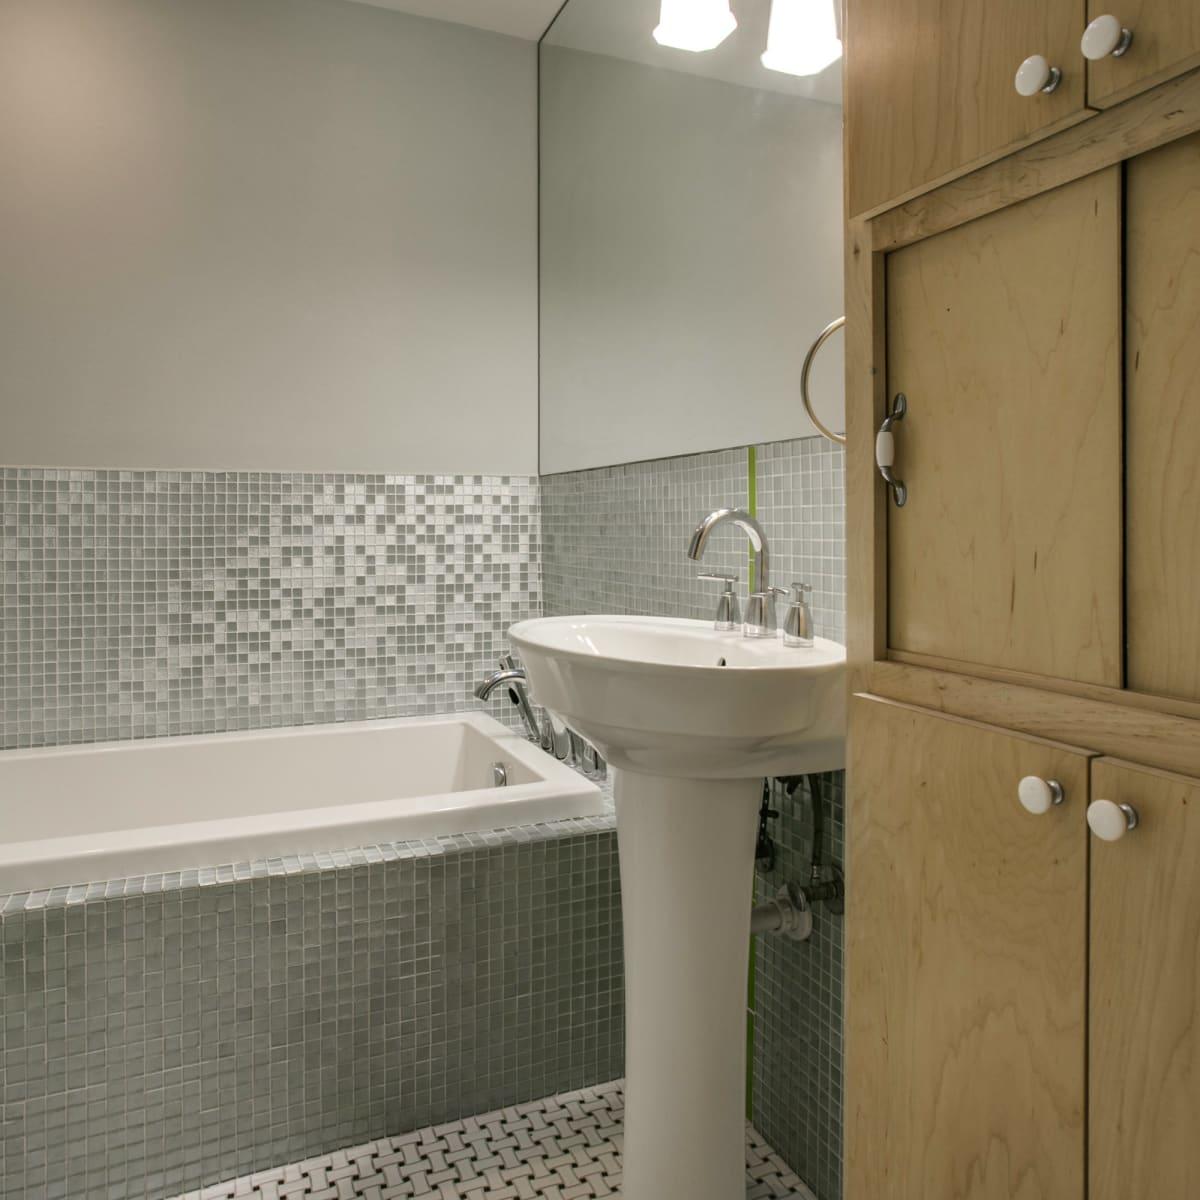 Bathroom at 3820 Shorecrest Dr. in Dallas